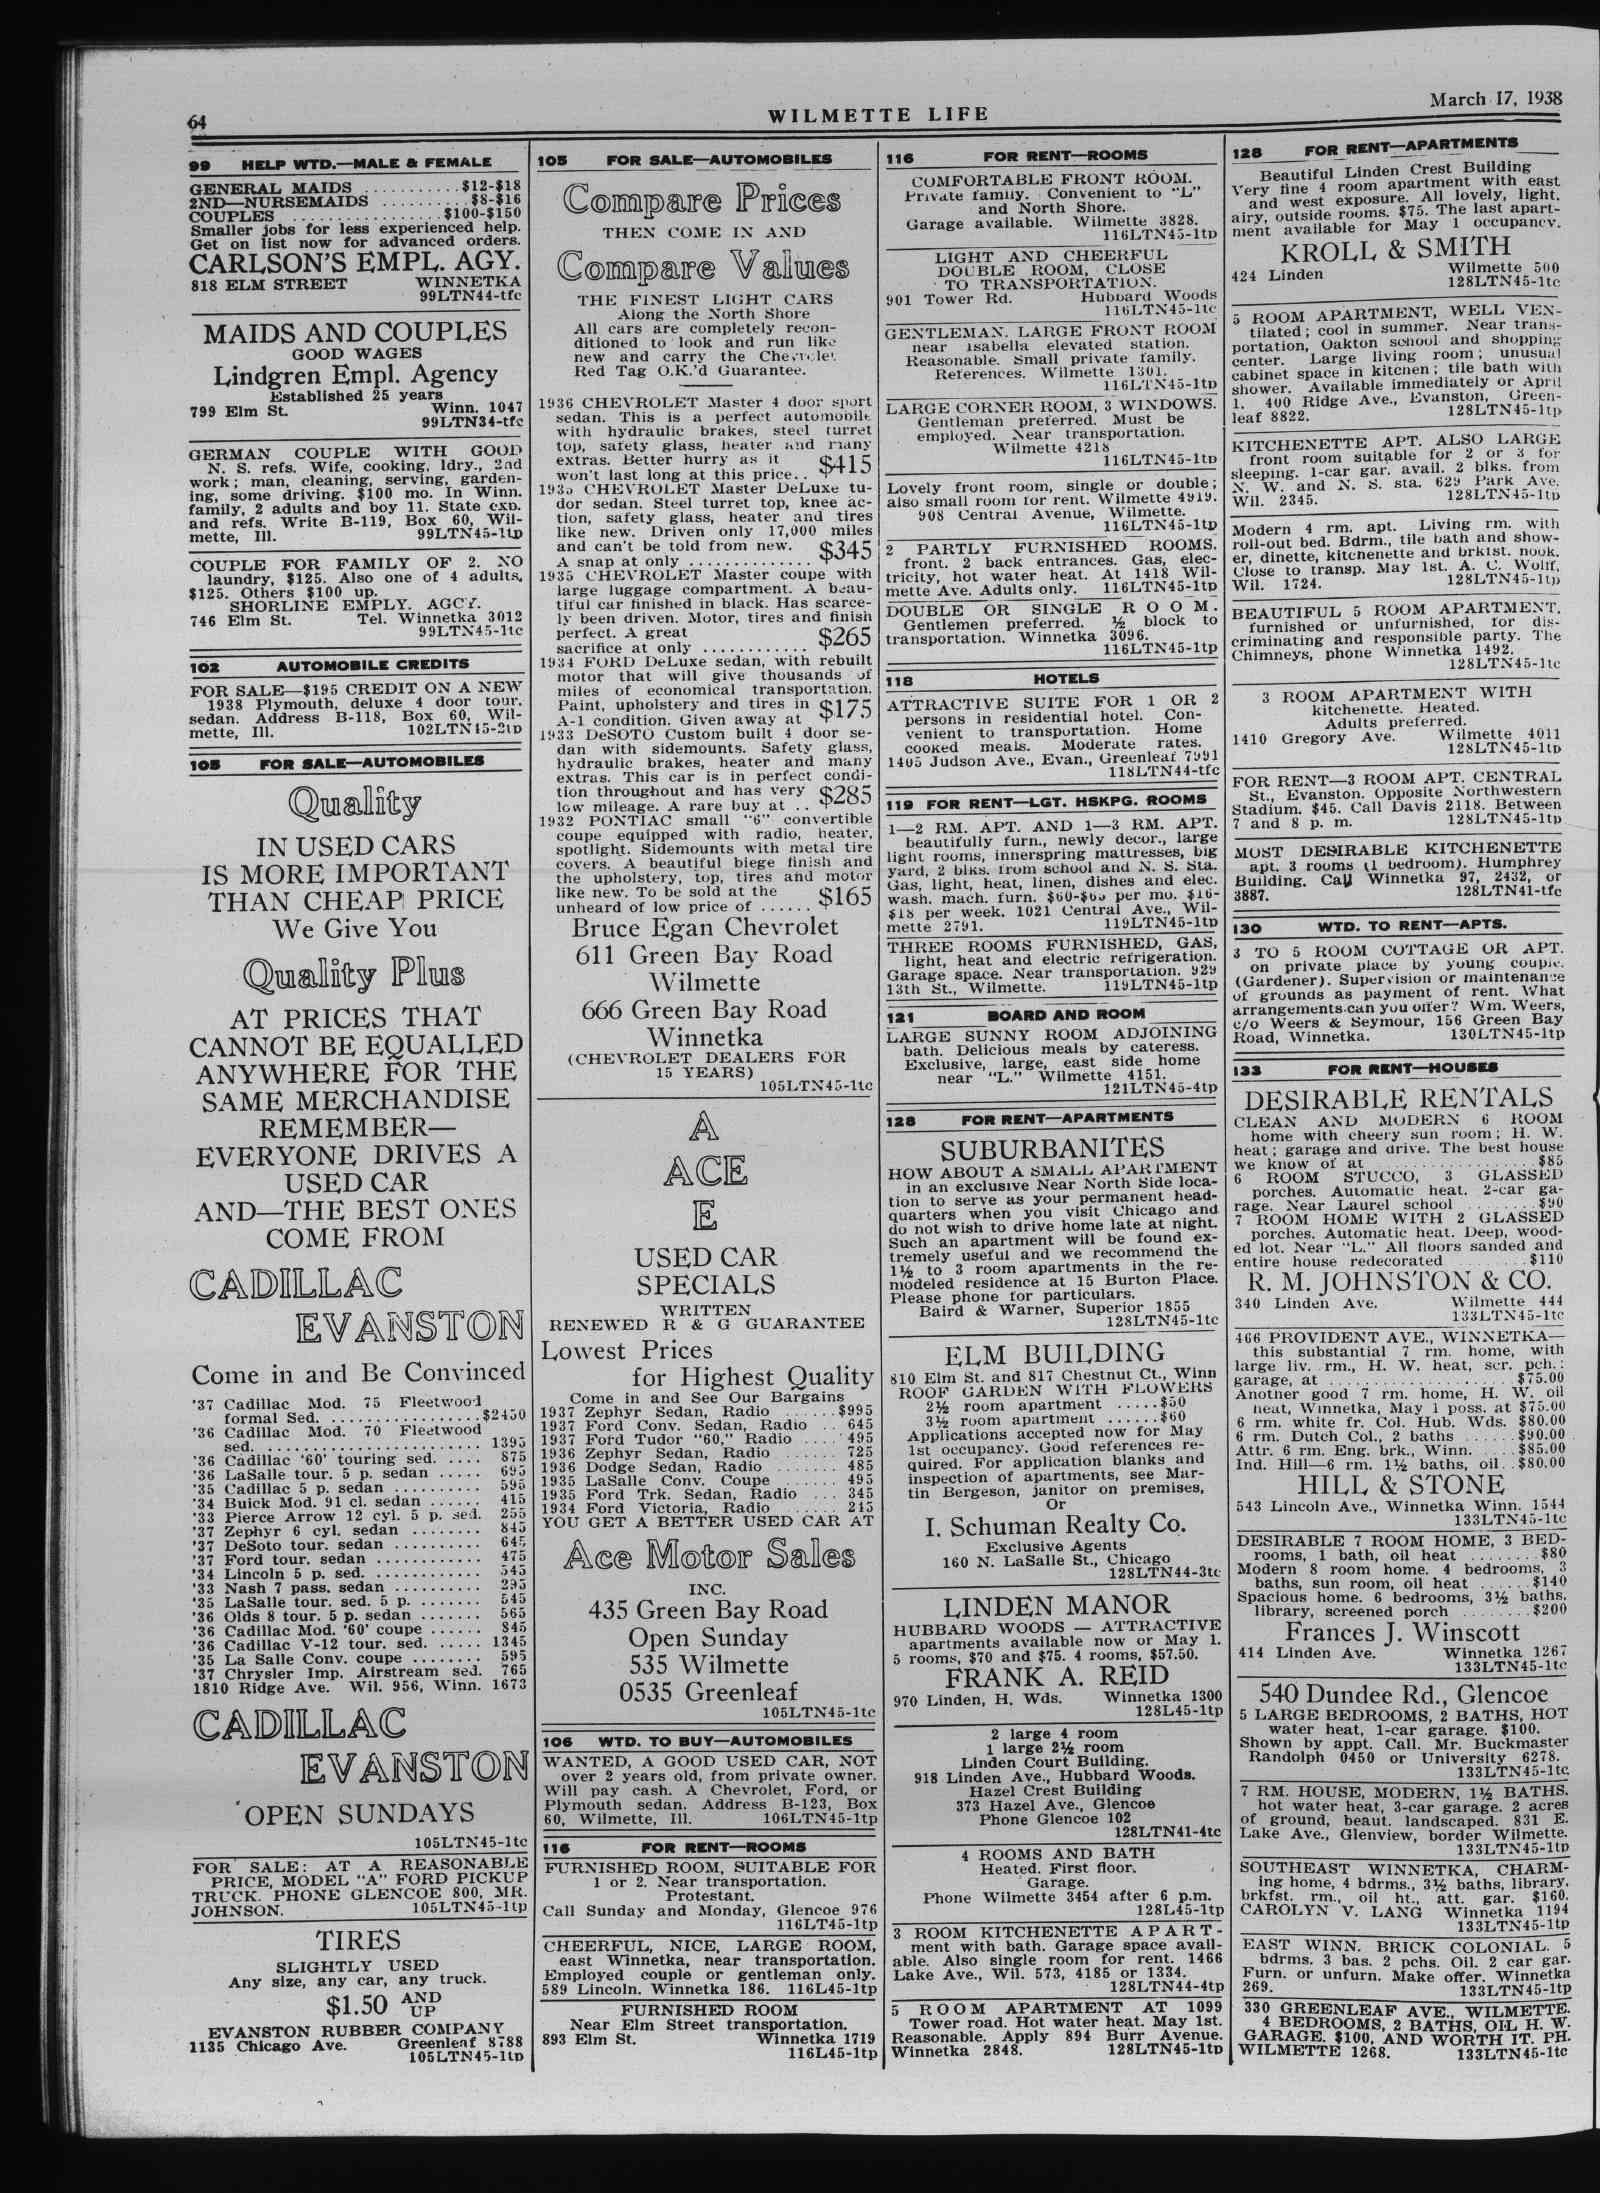 Wilmette Life (Wilmette, Illinois), 17 Mar 1938